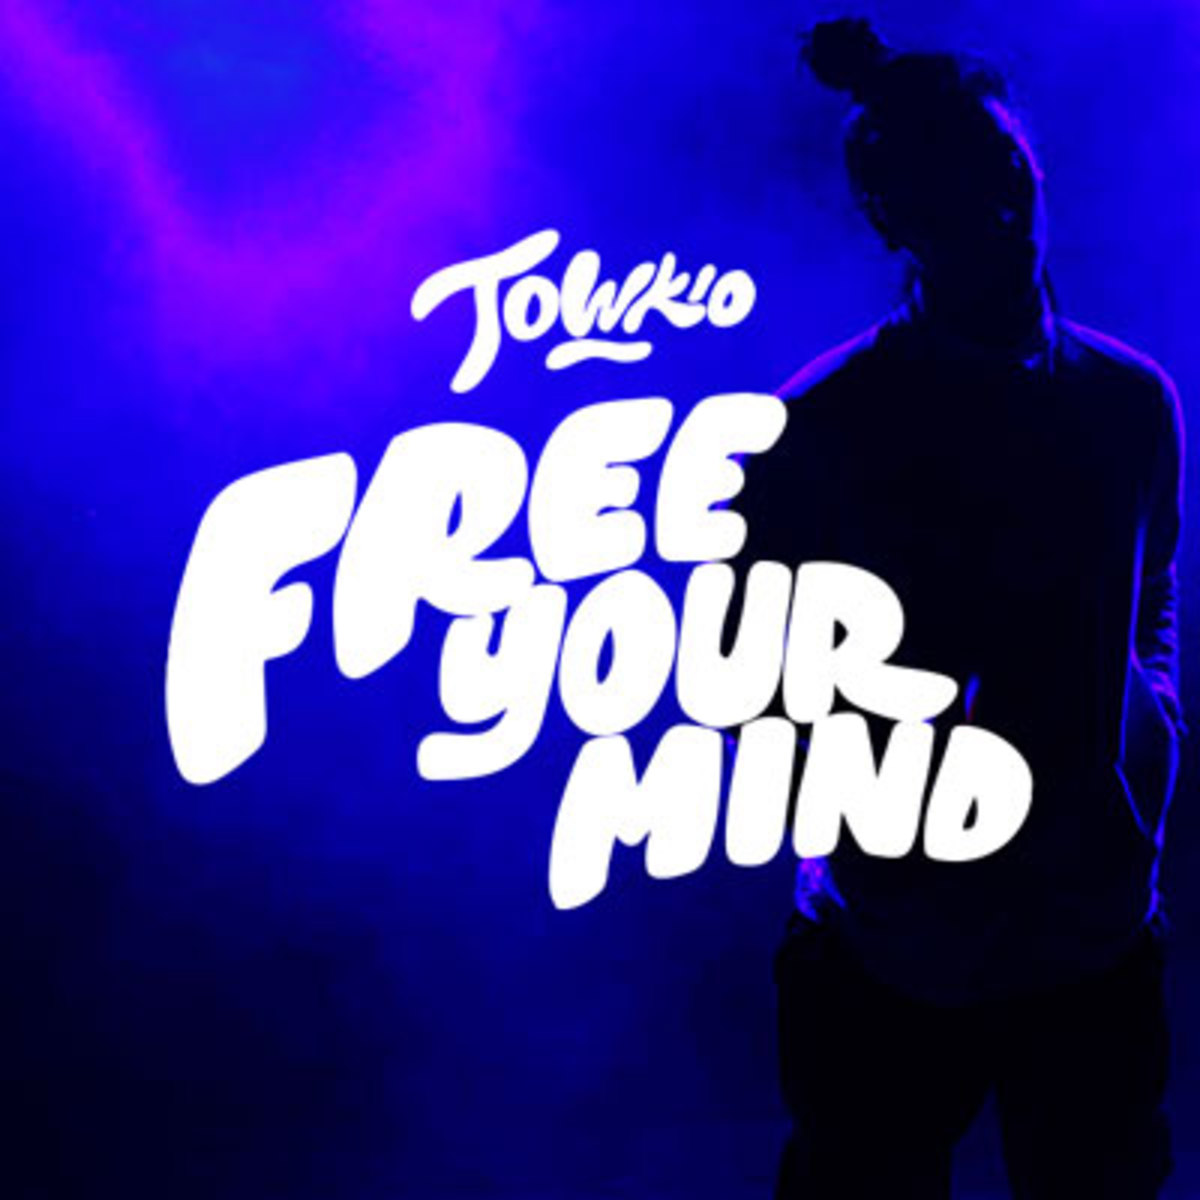 towkio-freeyourmind.jpg